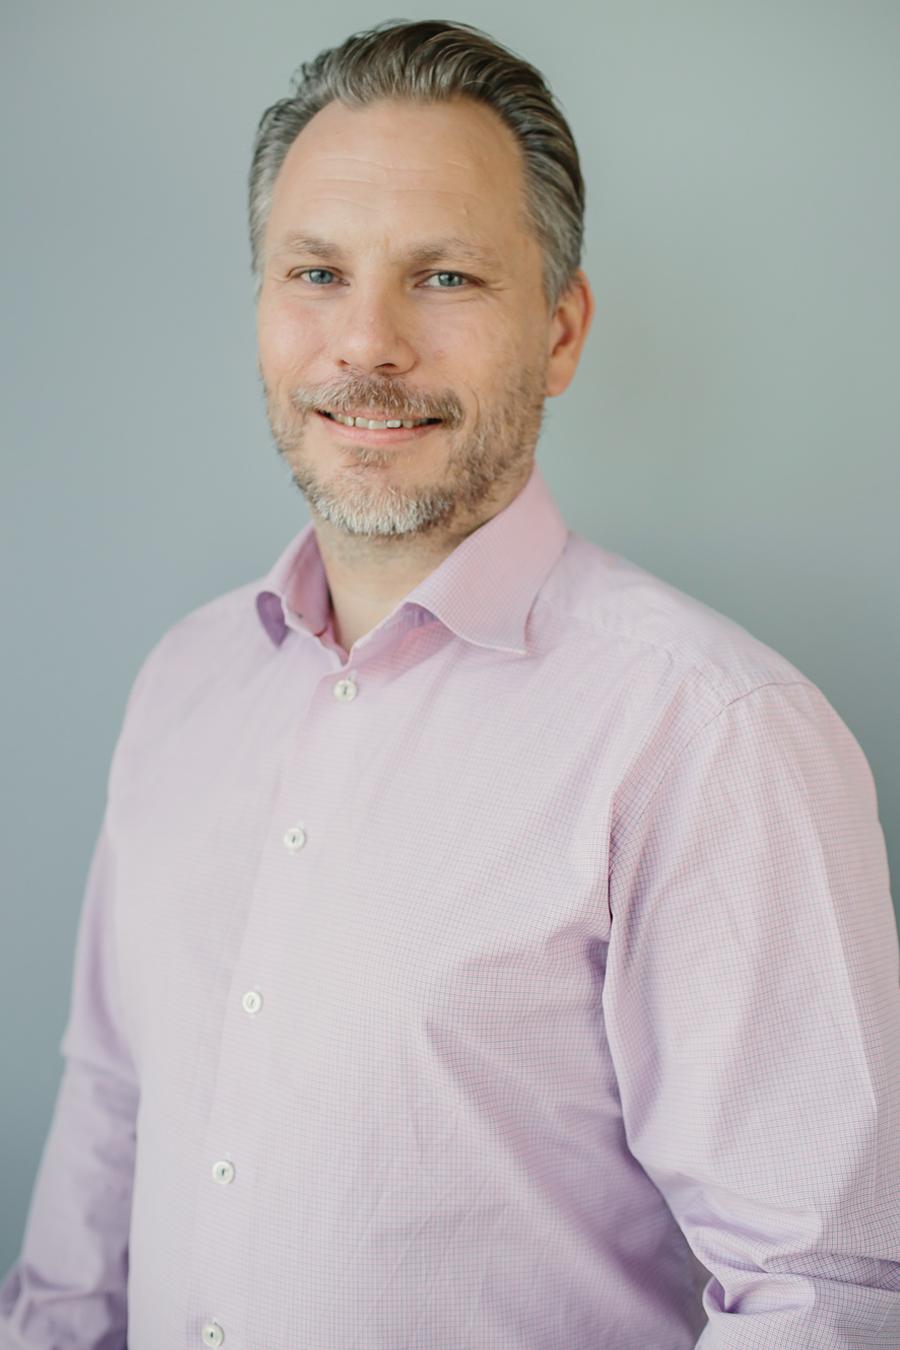 Martin Augustsson – Utvecklingschef på QBIS